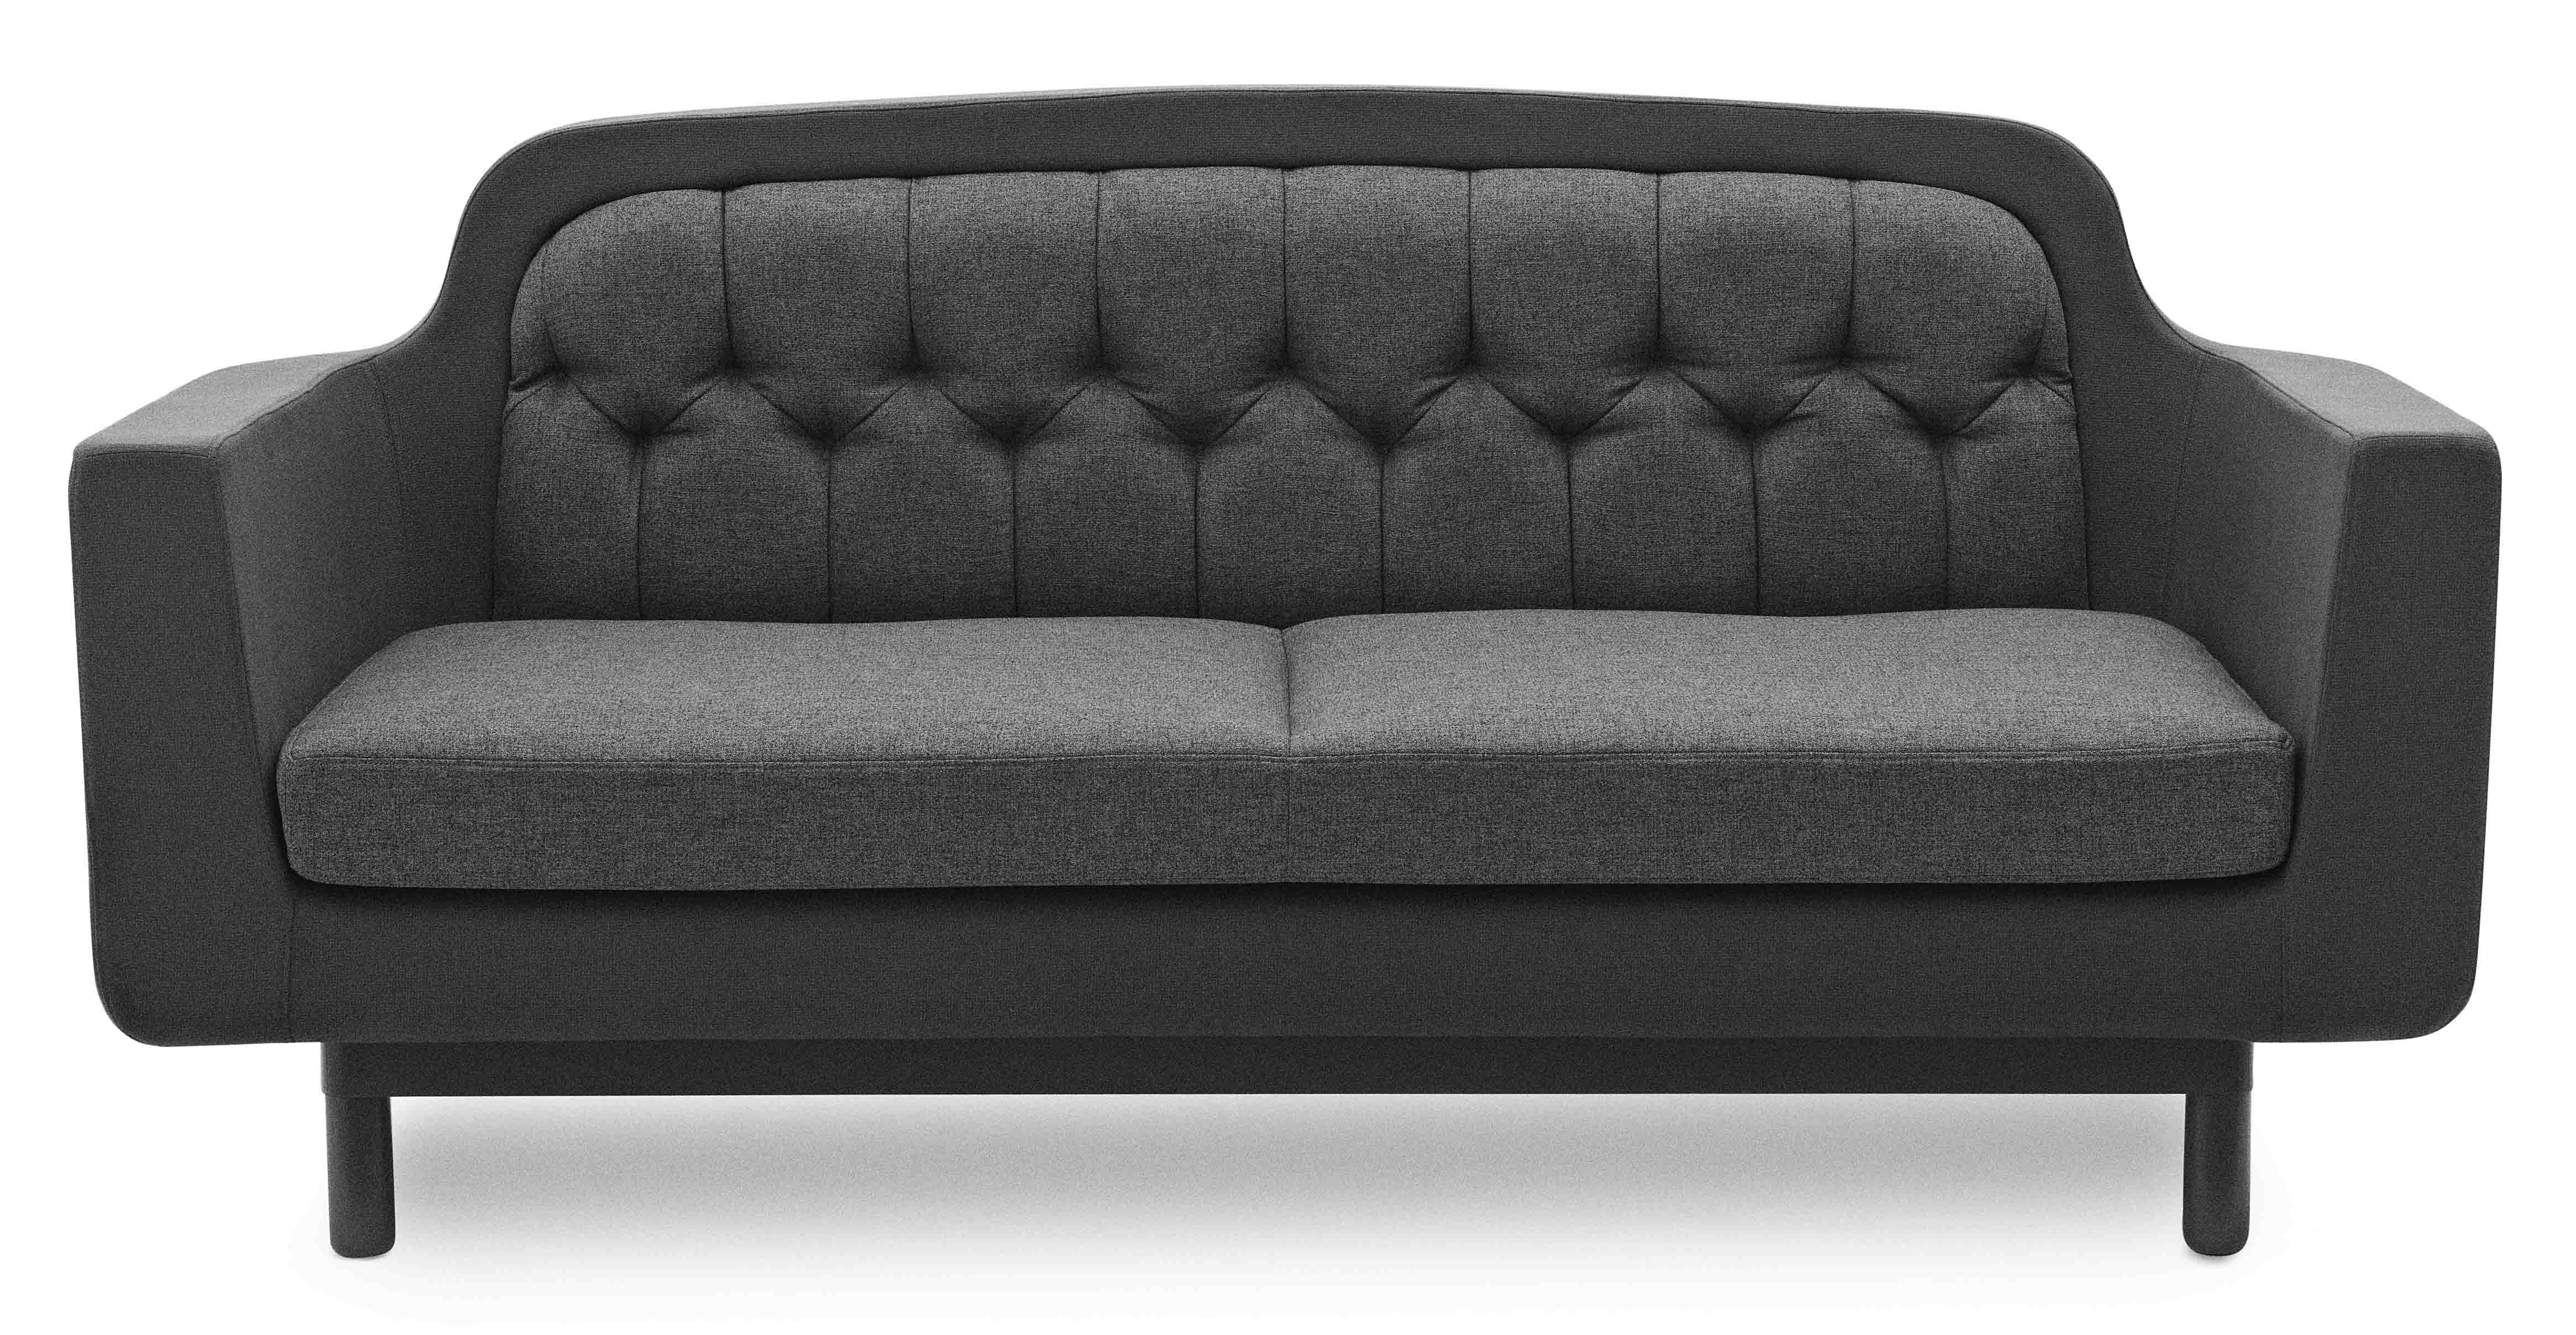 Onkel sofa 2 sits